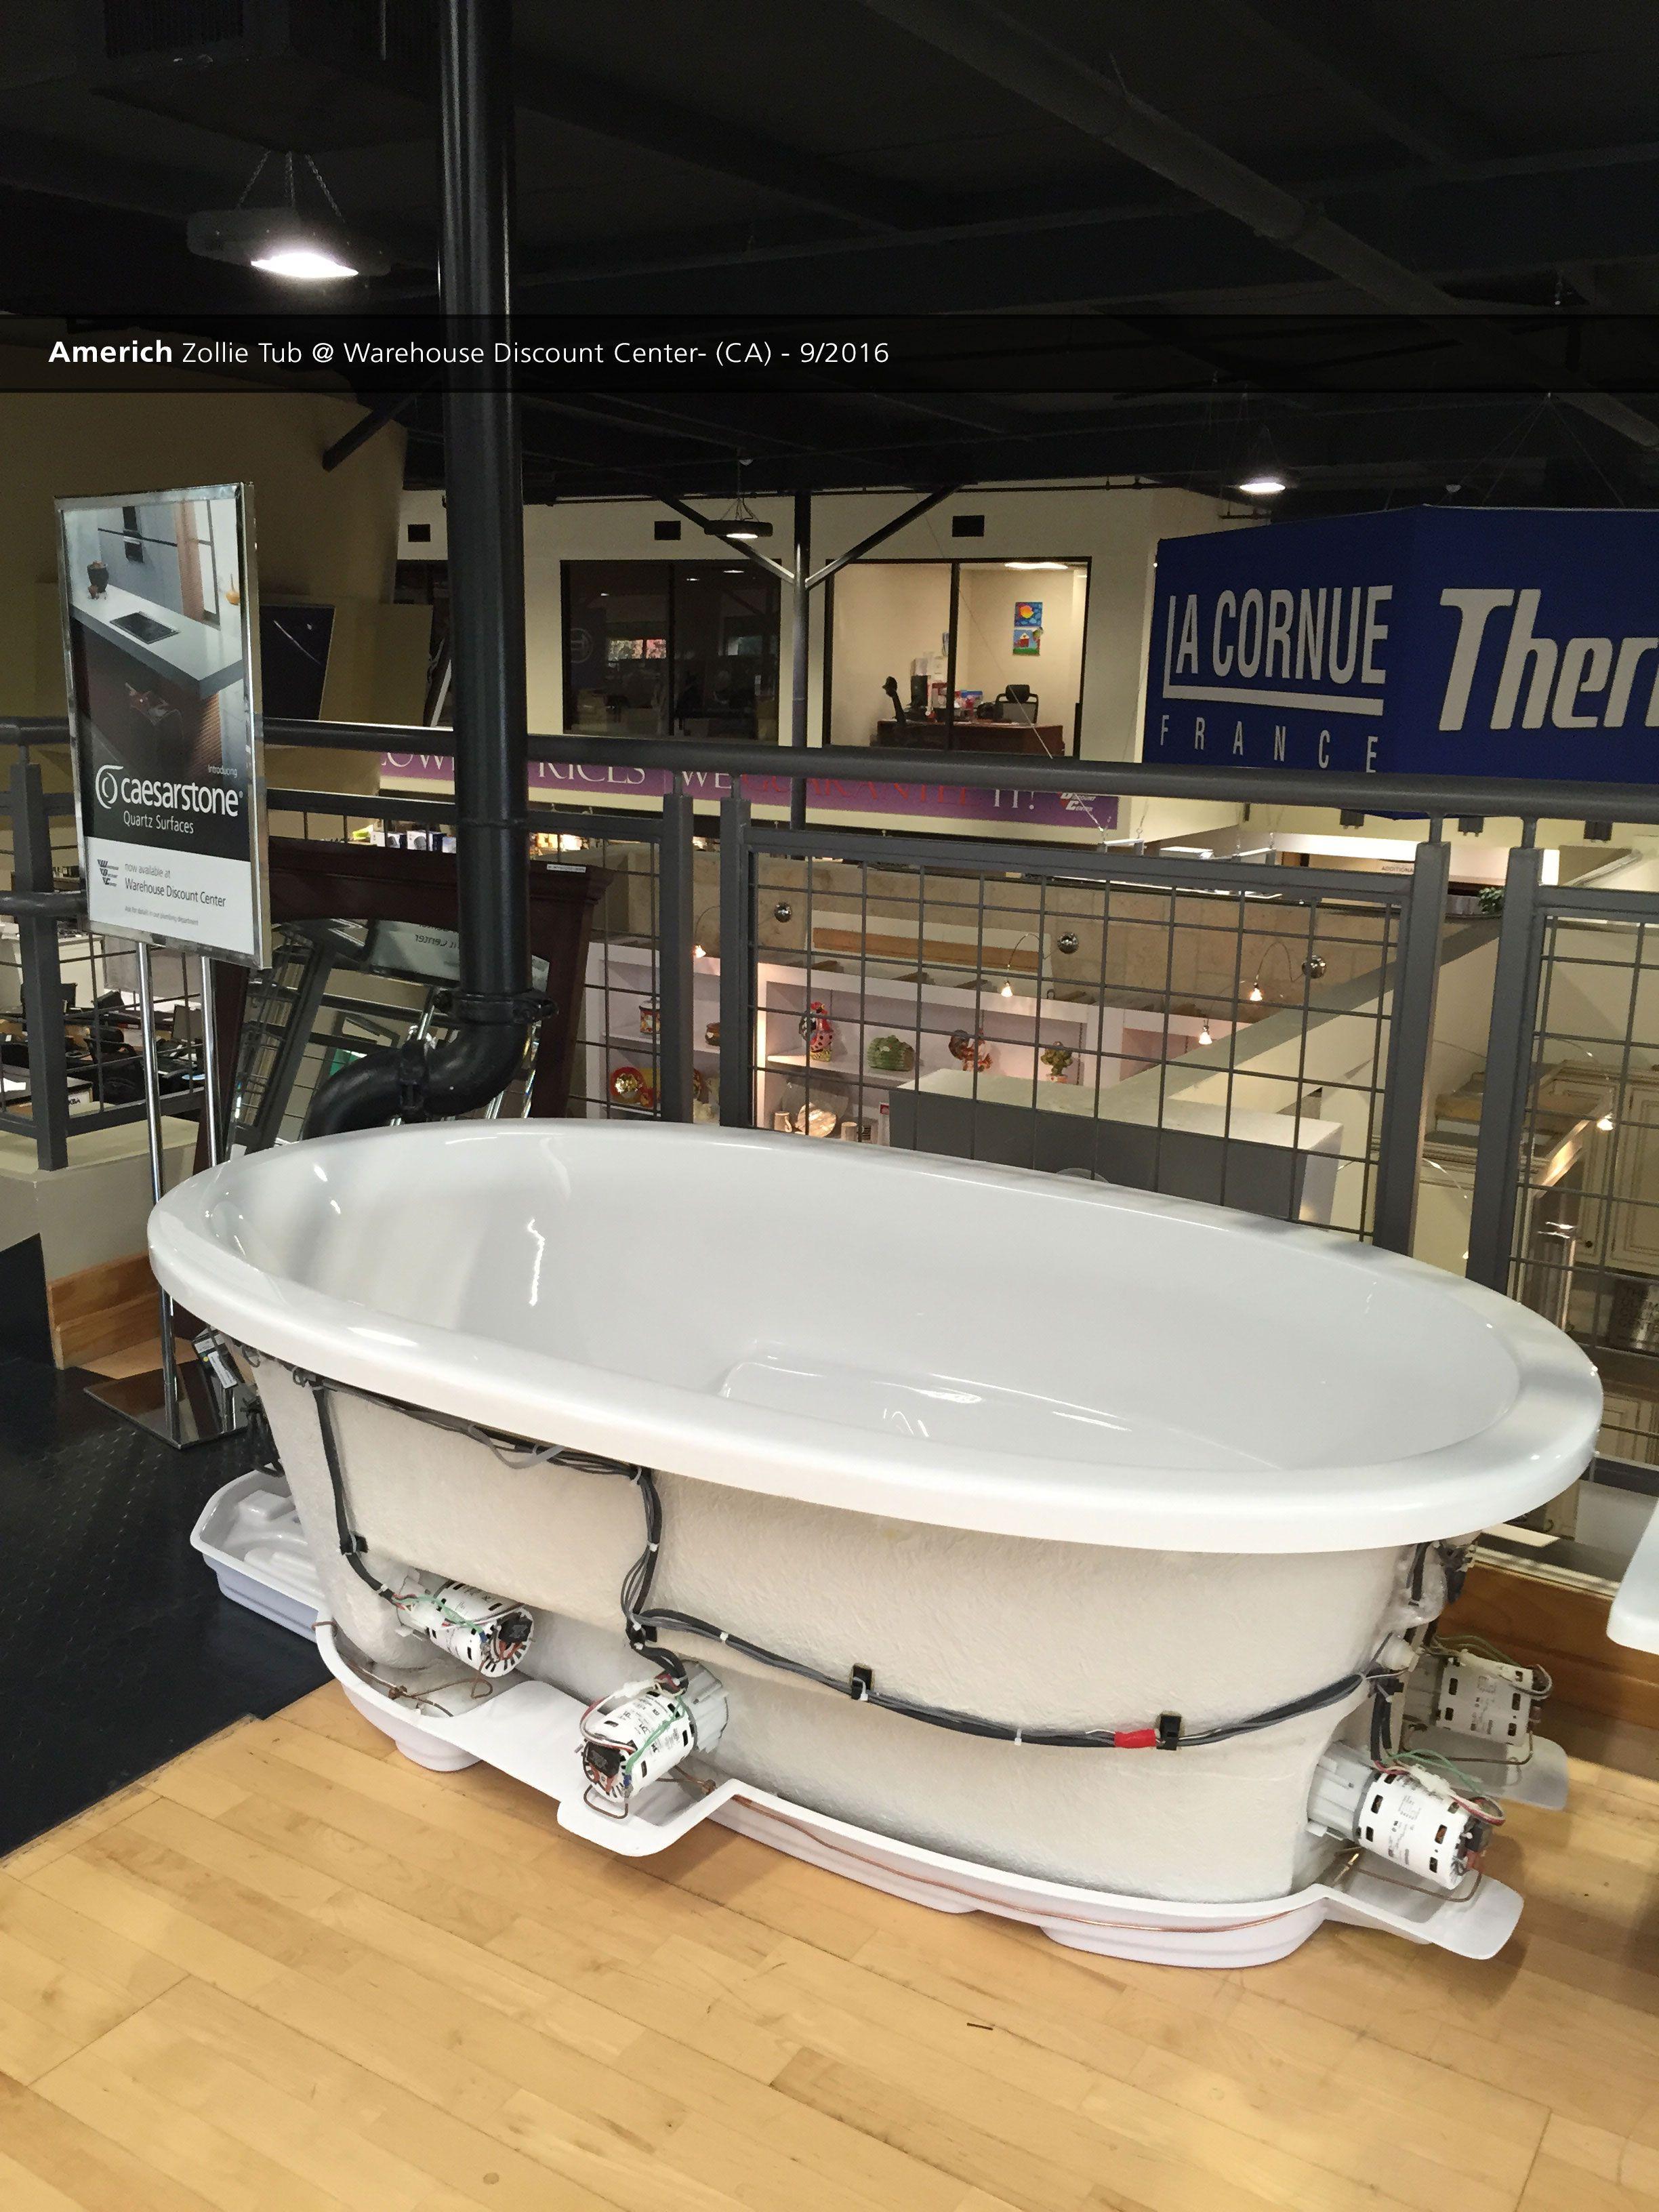 Americh Zollie Tub @ Warehouse Discount Center- (CA) - 9/2016 ...